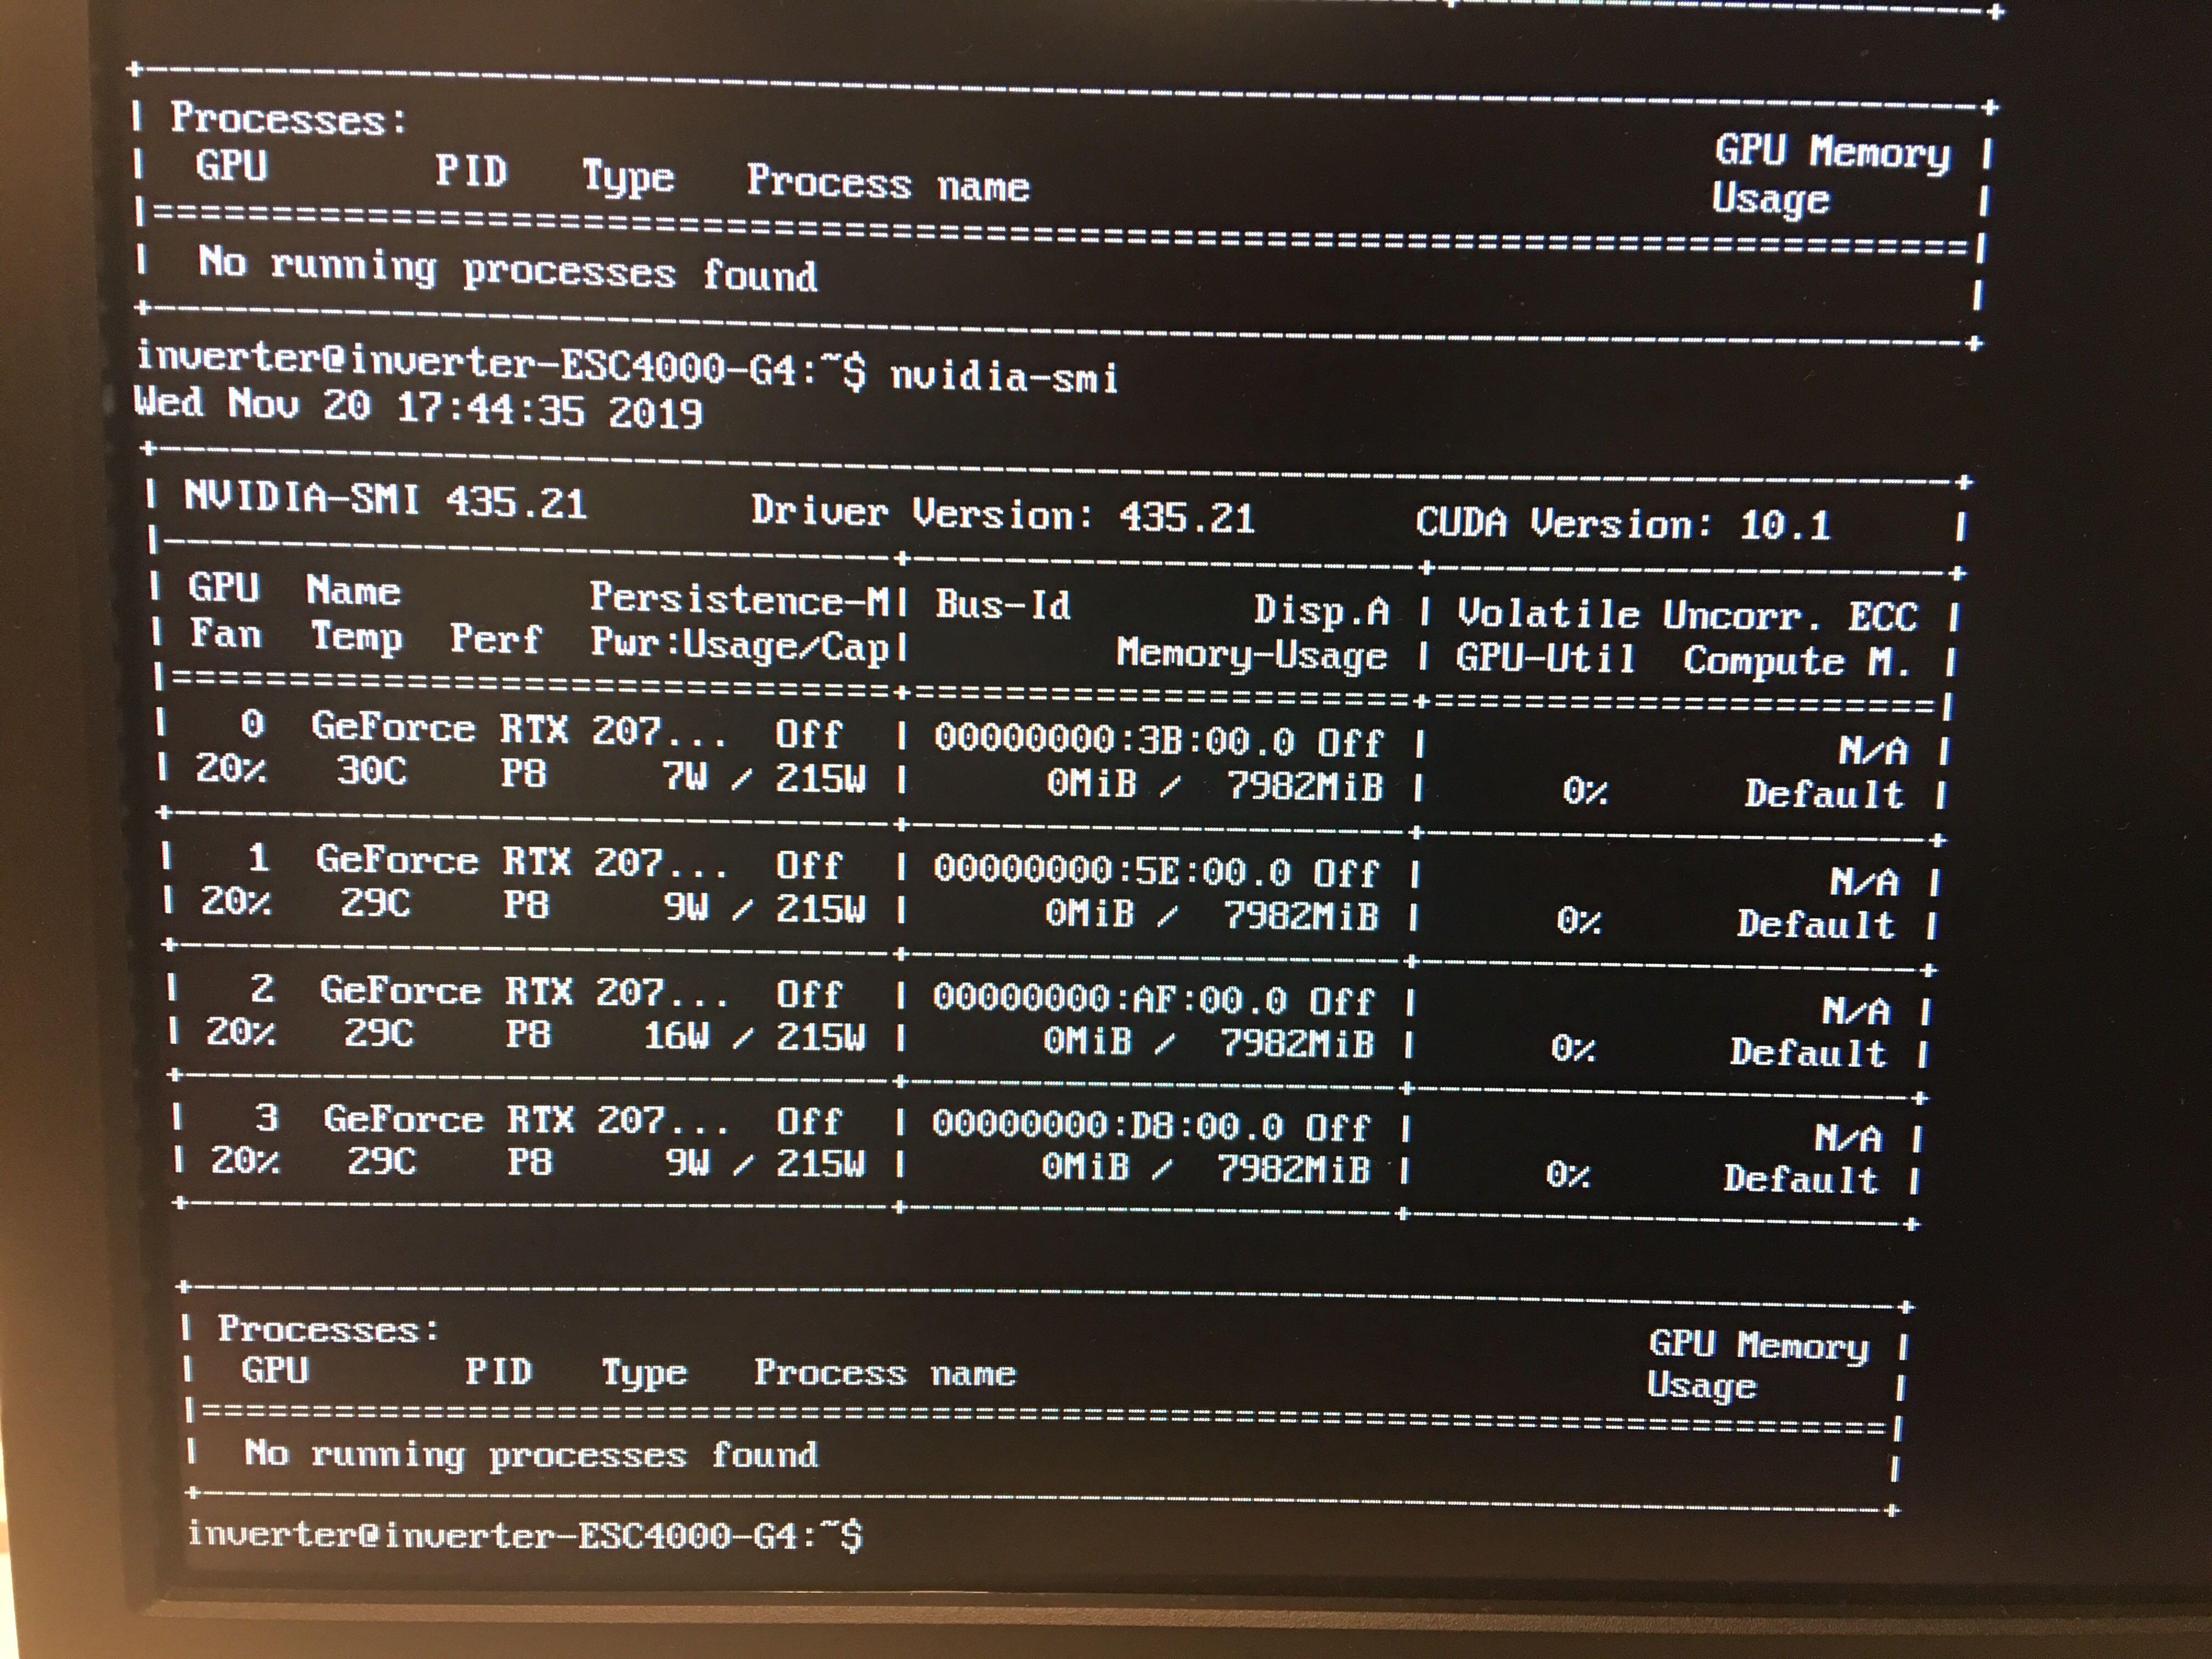 nvidia-smi only reporting 3/4 GPUs while Ubuntu reports 4/4